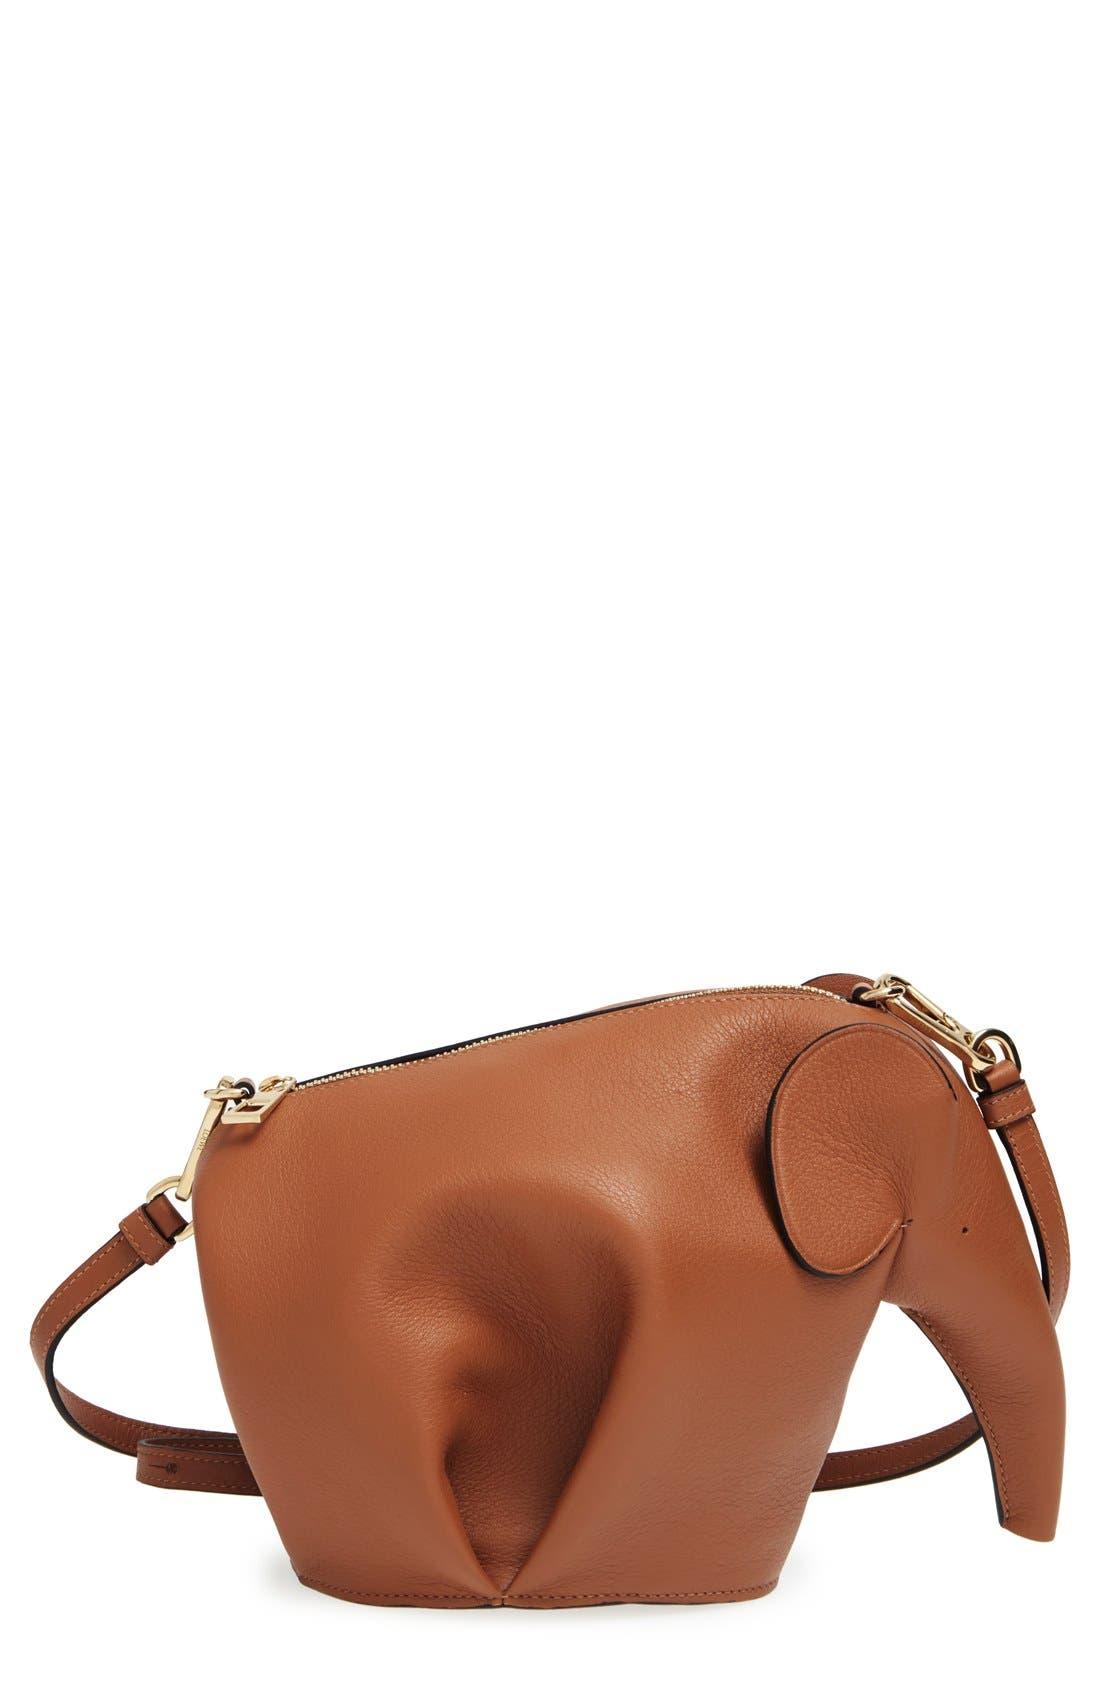 'Mini Elephant' Crossbody Bag,                             Main thumbnail 3, color,